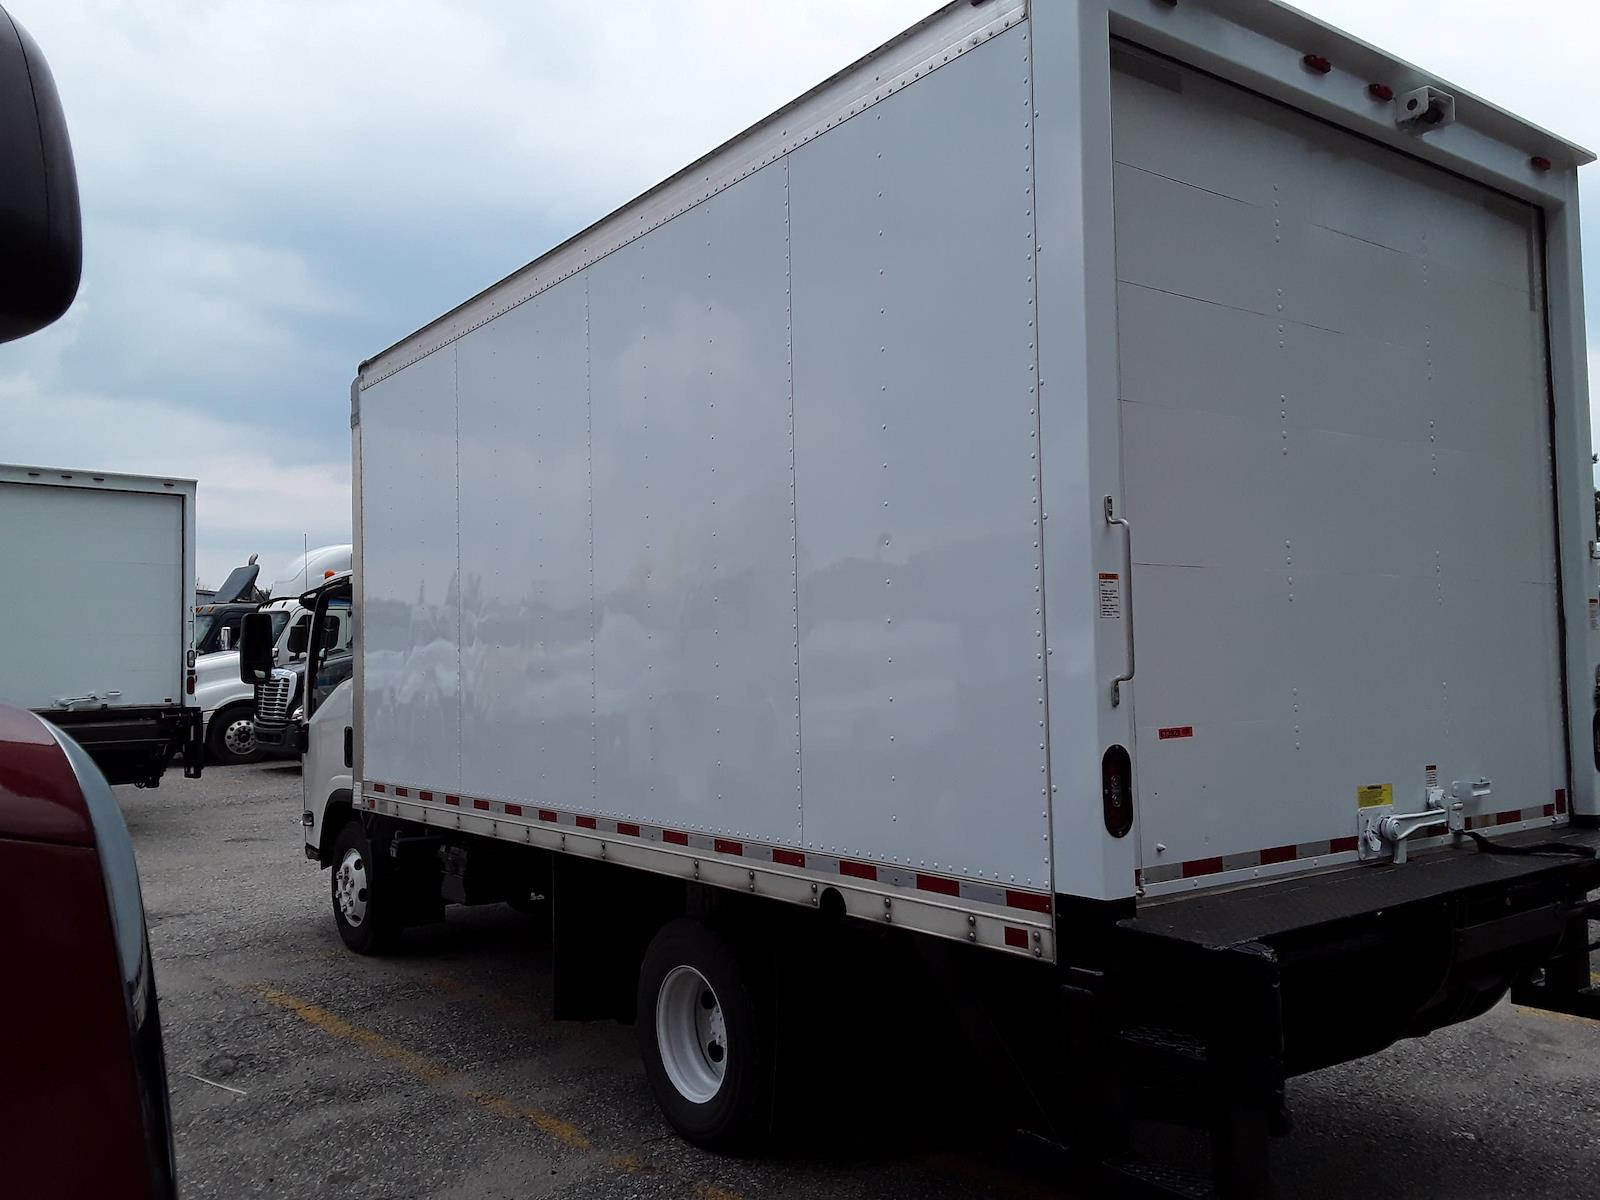 2016 Isuzu NPR Regular Cab 4x2, Dry Freight #673928 - photo 1